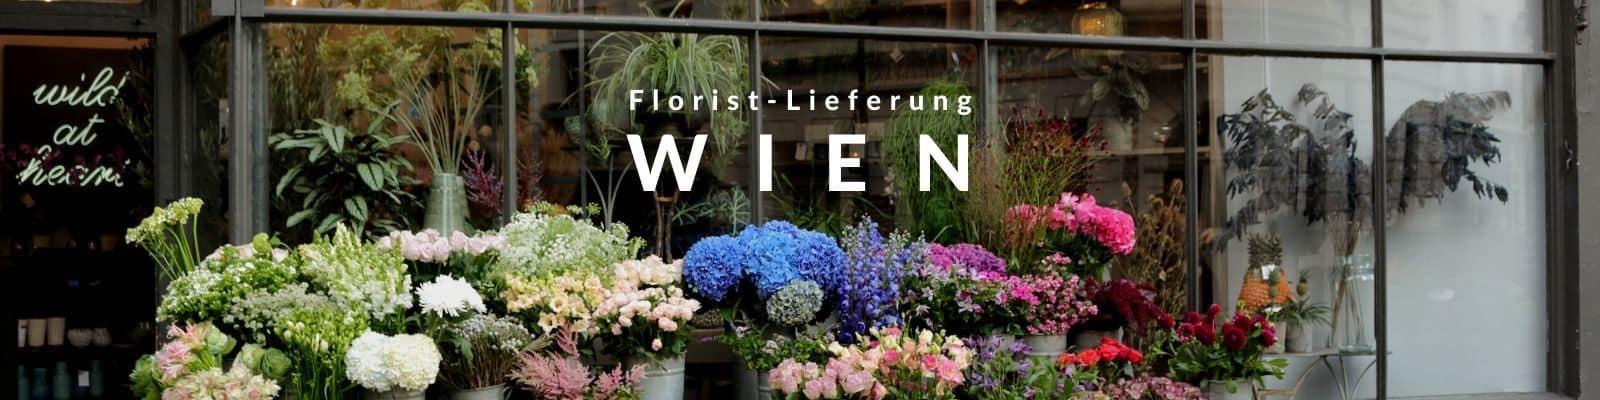 Blumen verschicken Wien - Blumenversand Express